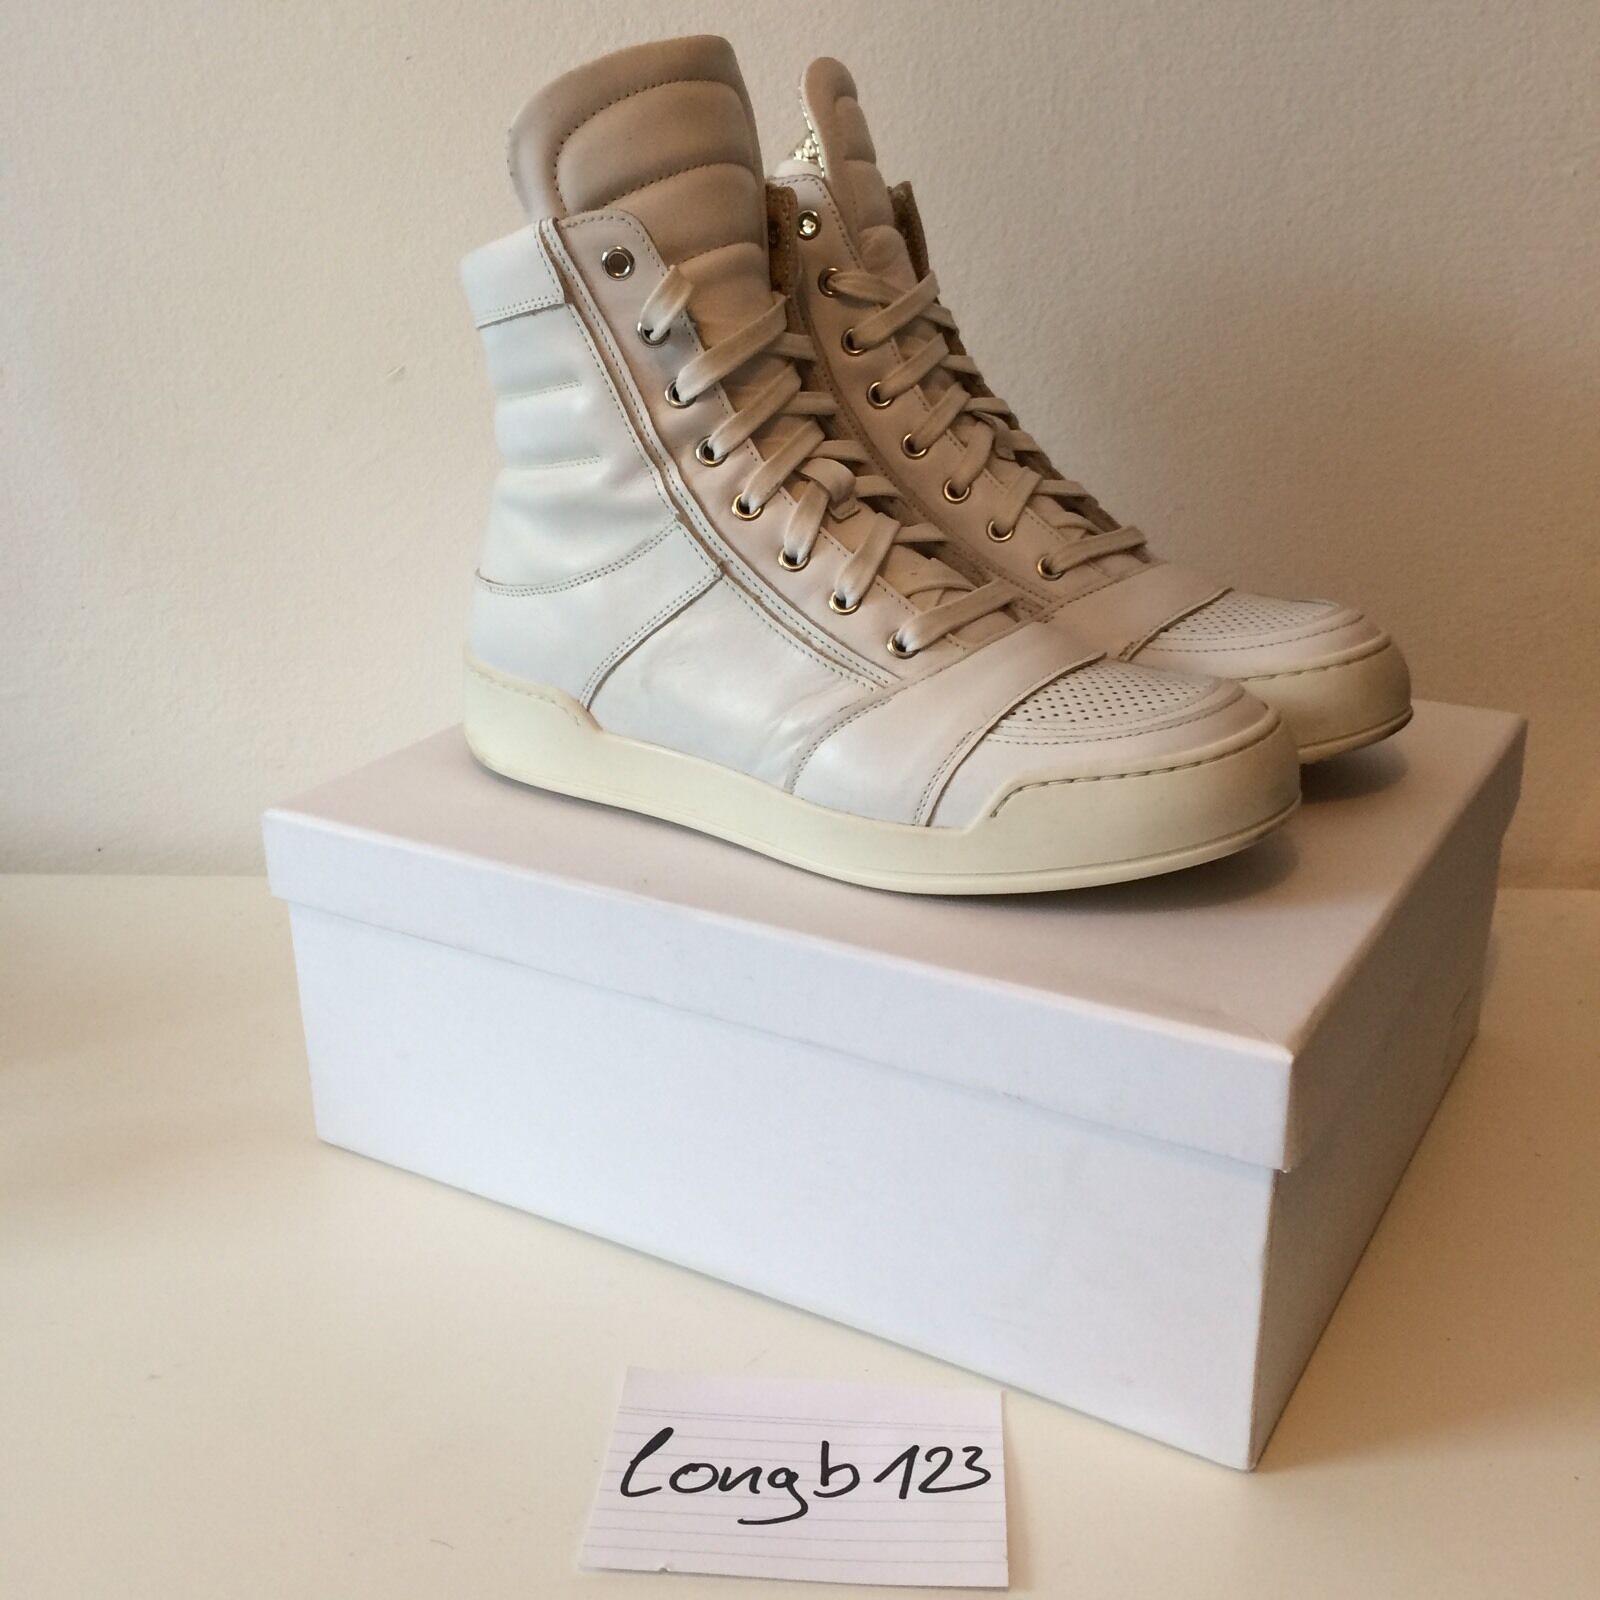 Balmain Balmain Balmain High Top Sneaker Size 41 White Kanye Yeezy be244c